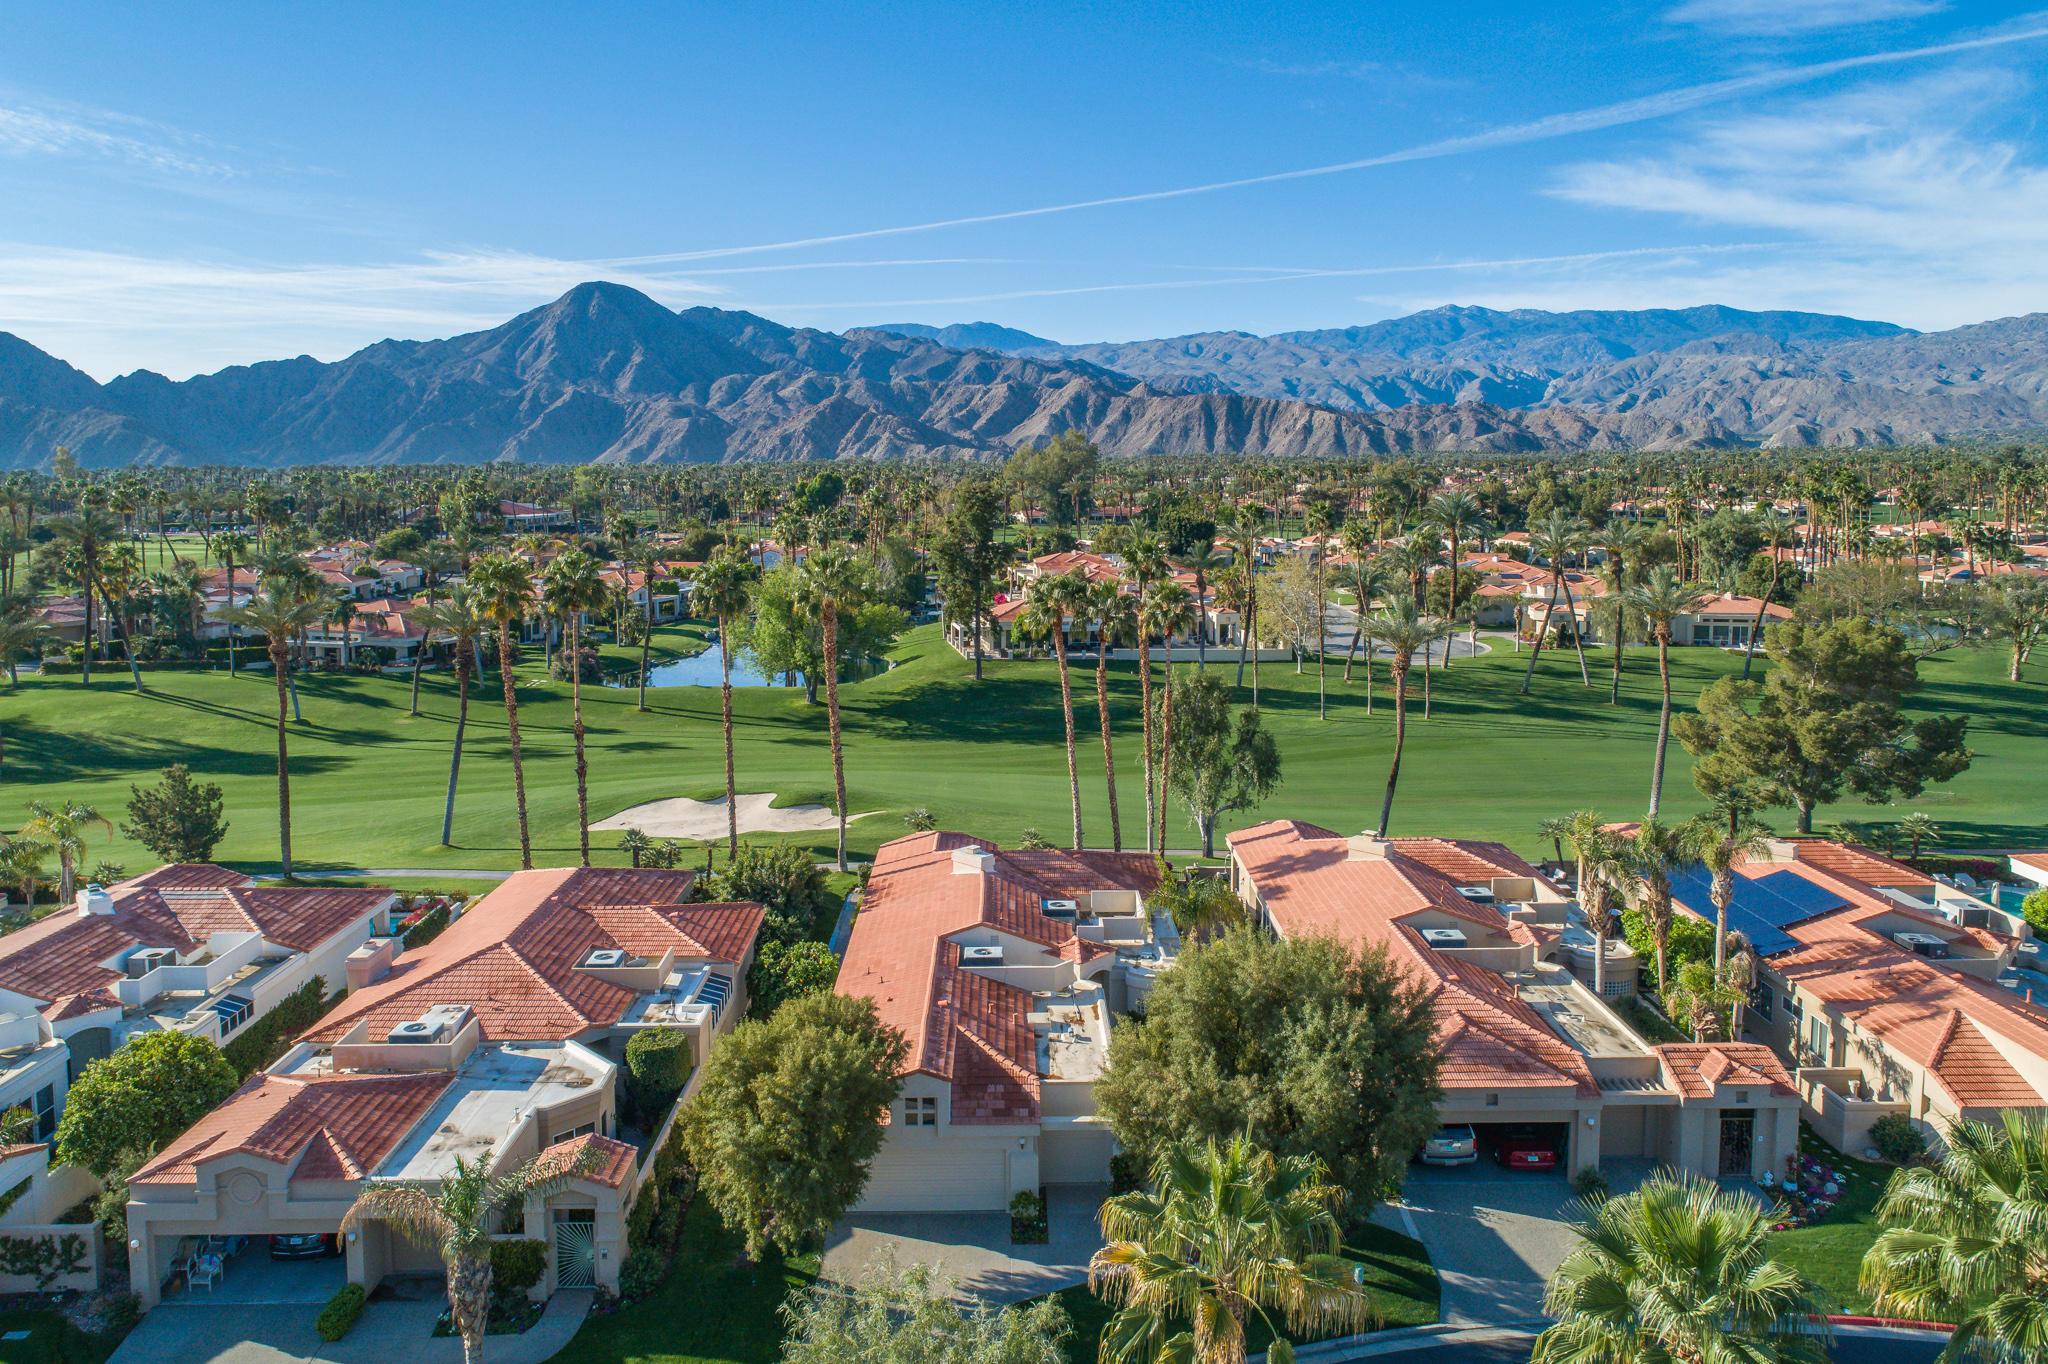 75337 Spyglass Drive, Indian Wells, California 92210, 3 Bedrooms Bedrooms, ,4 BathroomsBathrooms,Residential,For Sale,75337 Spyglass Drive,219041422